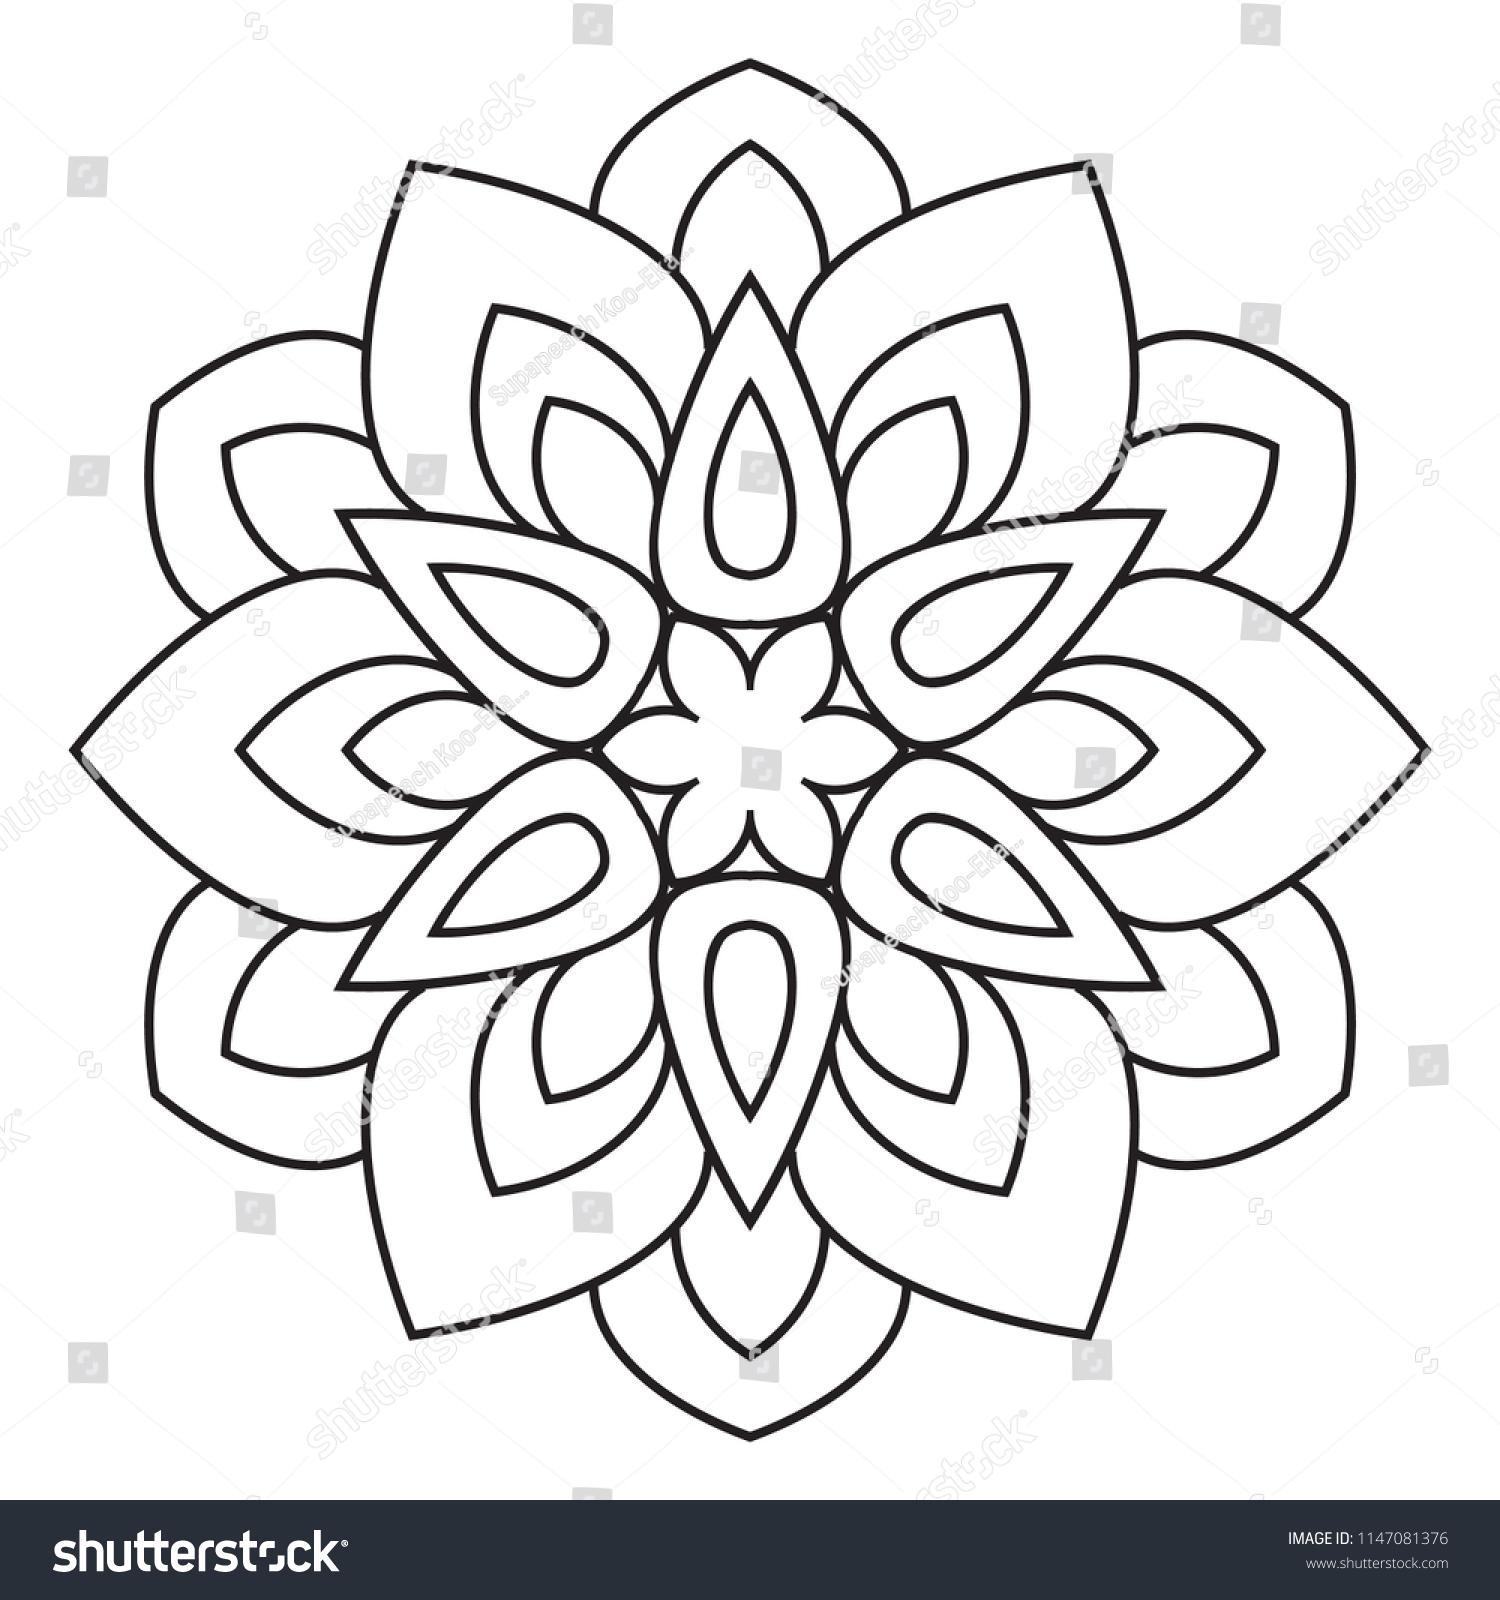 Easy Mandala Basic Simple Mandalas Coloring Stock Illustration ...